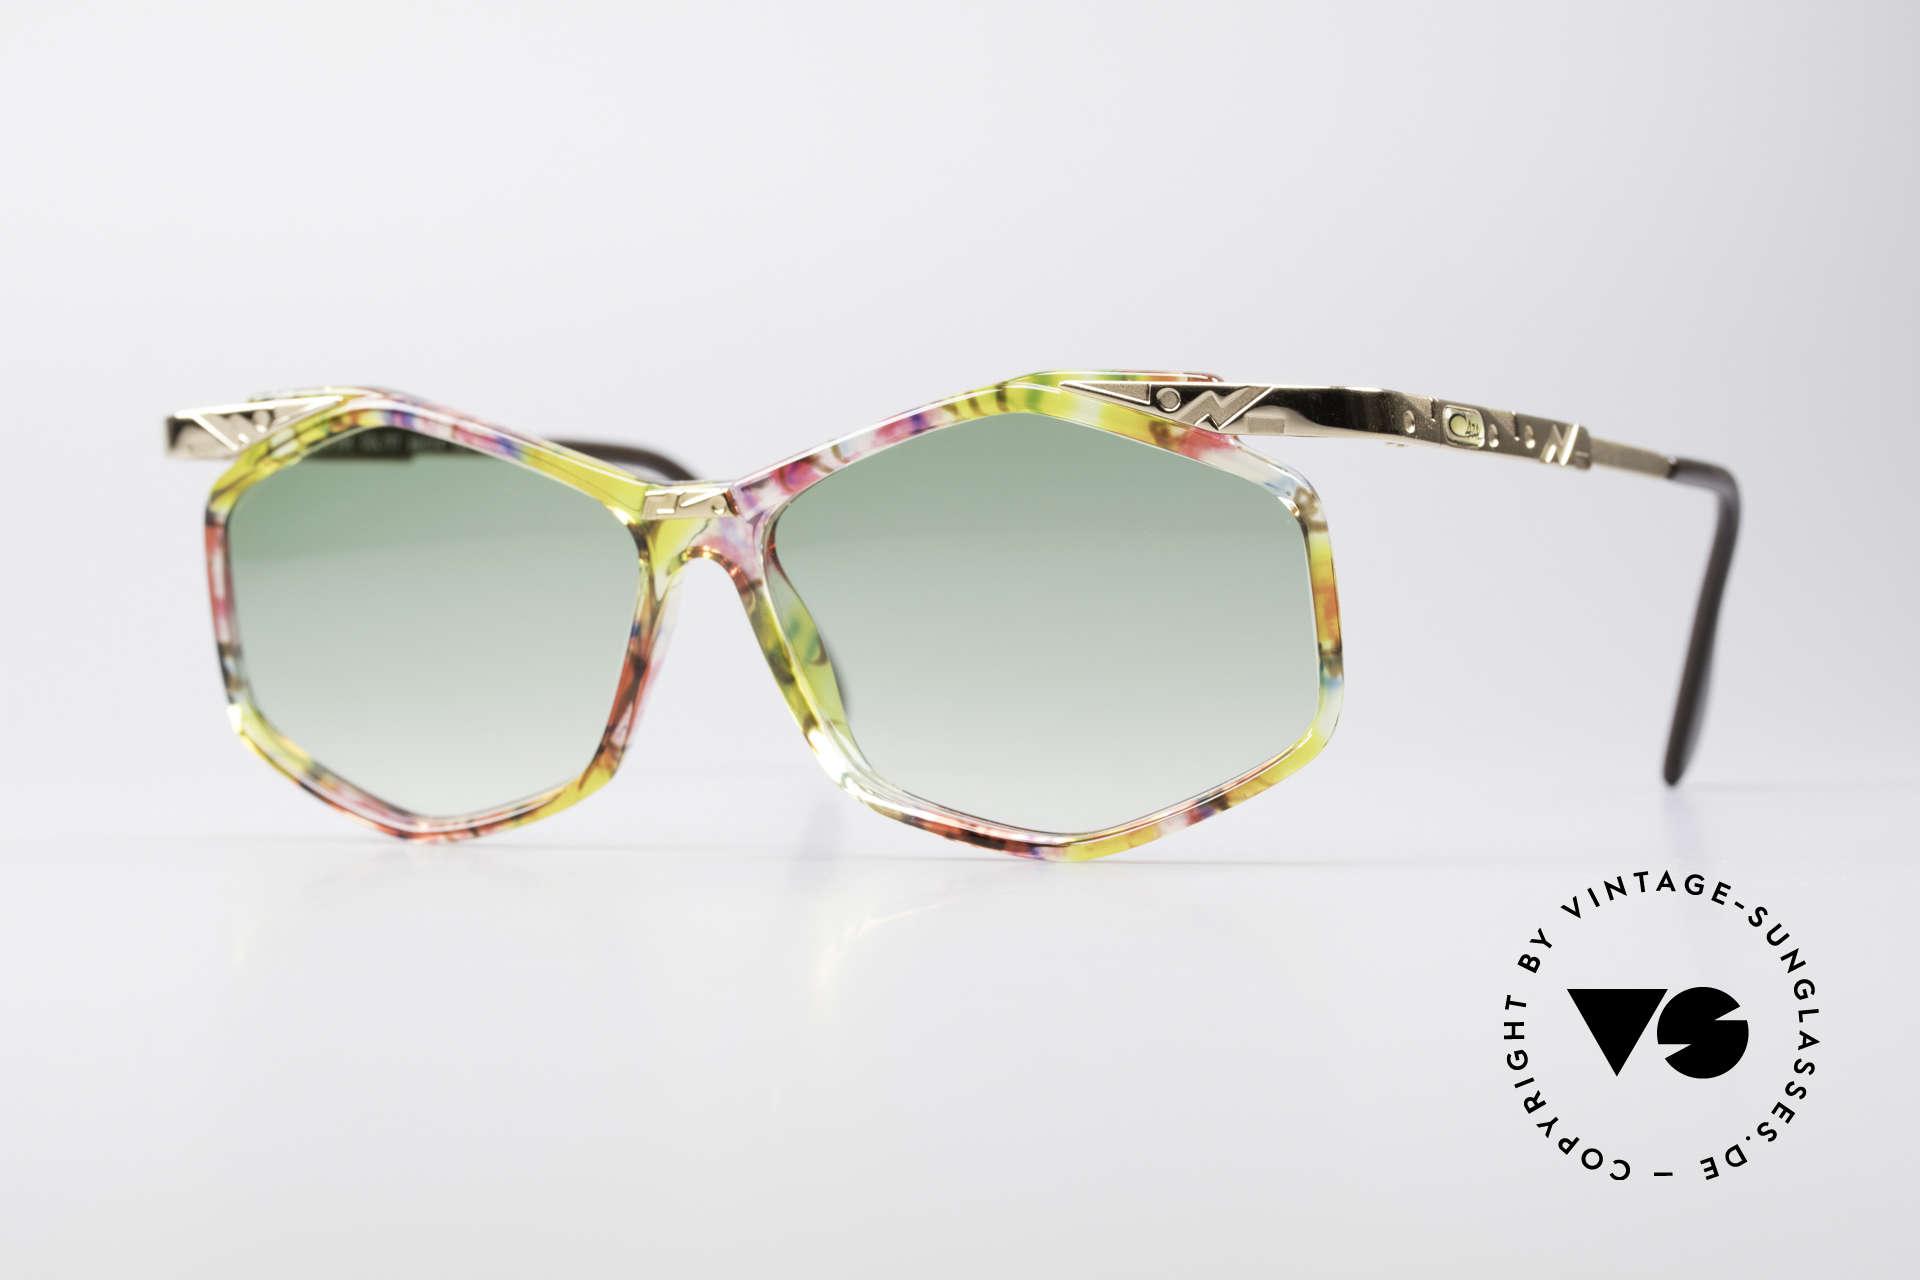 Cazal 354 Vintage 90s Sunglasses Women, extraordinary Cazal designer sunglasses from 1992, Made for Women